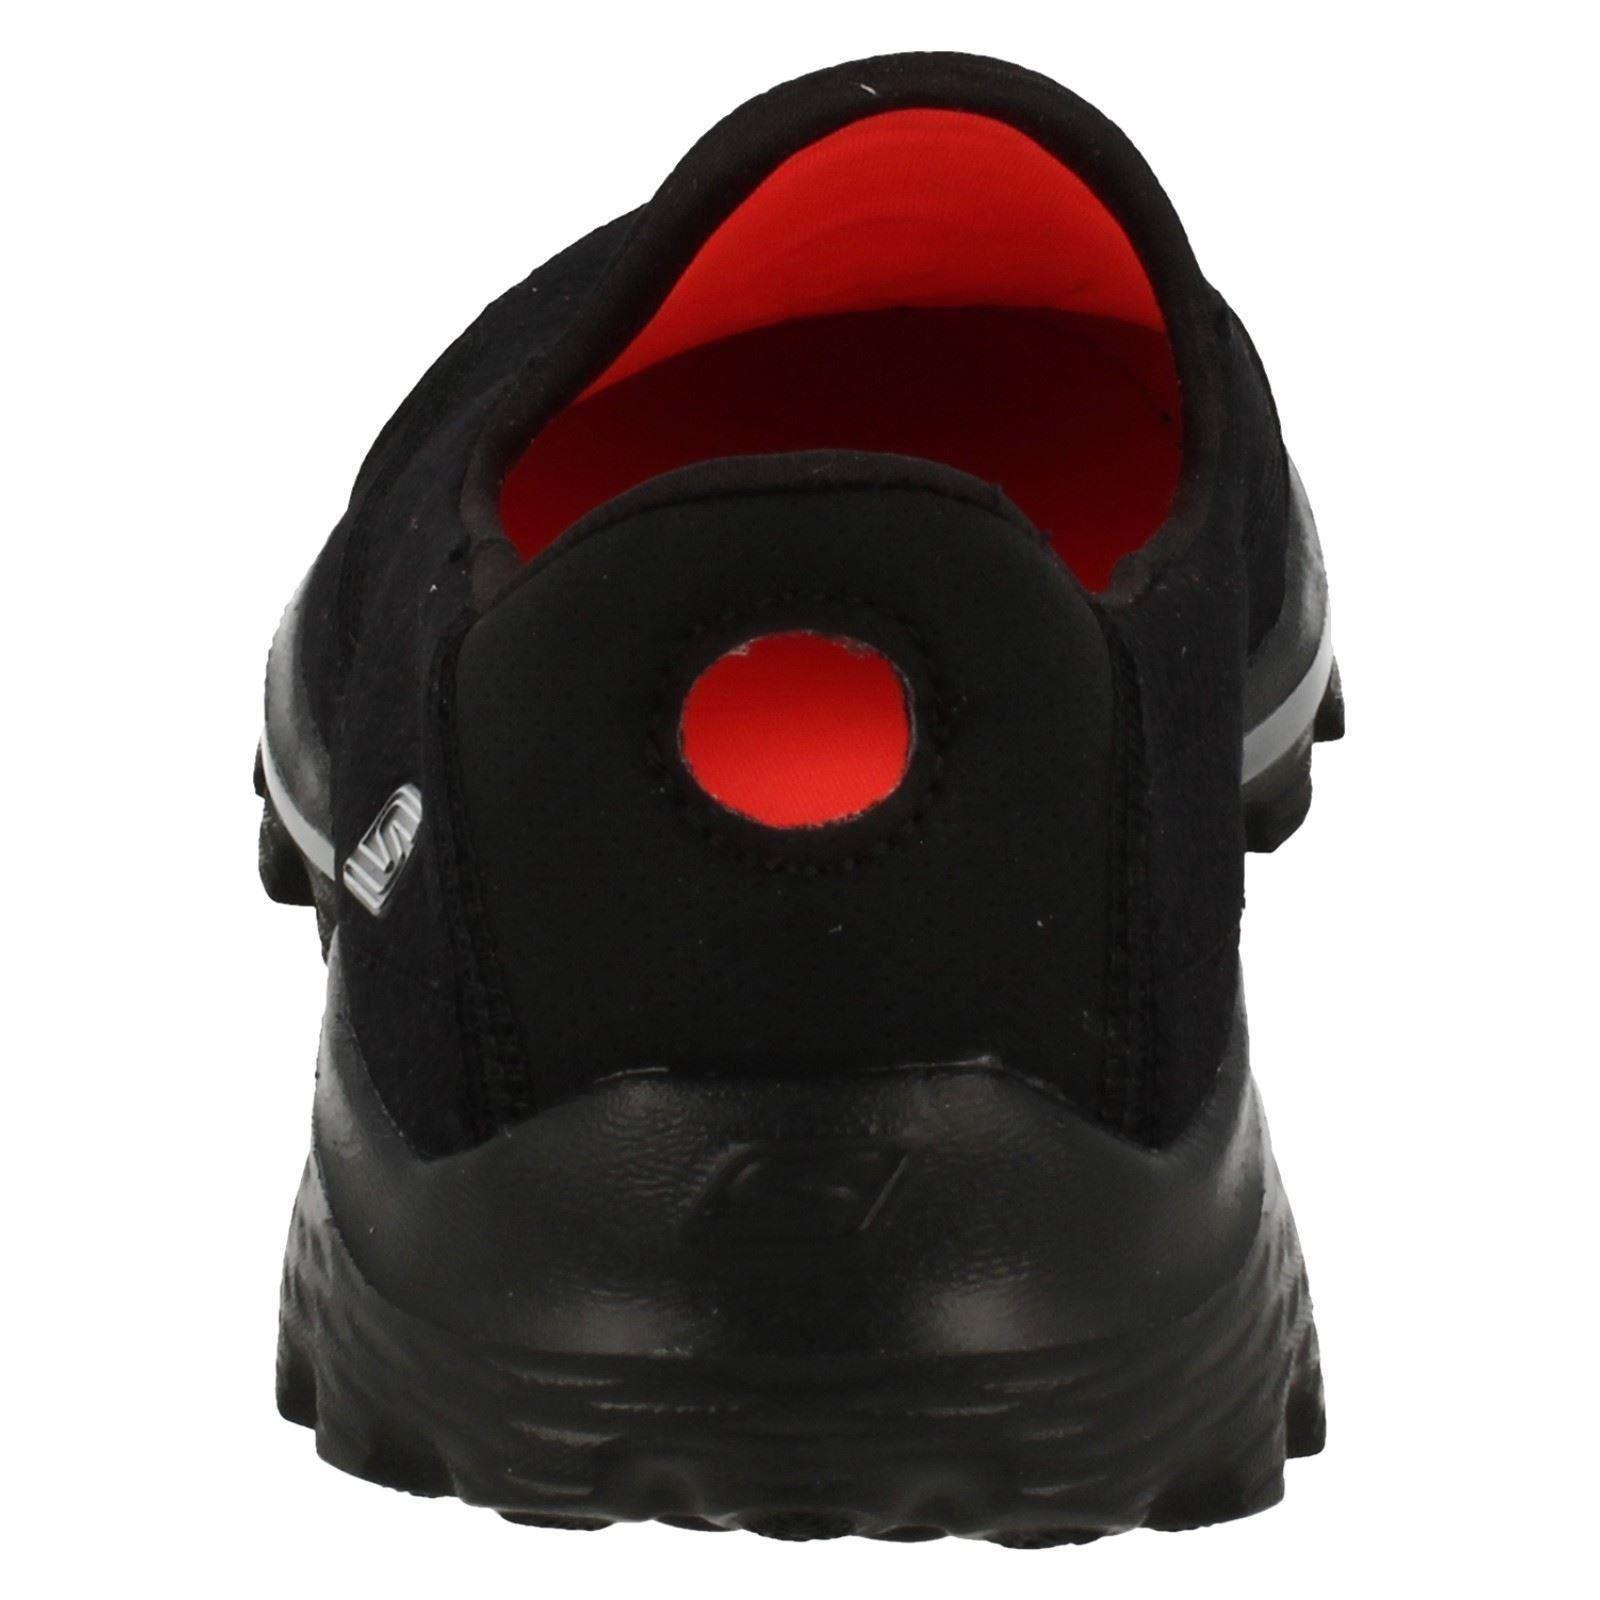 Skechers Go Walk 2 Informales Bombas Bombas Bombas De Las Señoras-Lineal 13597 22a412